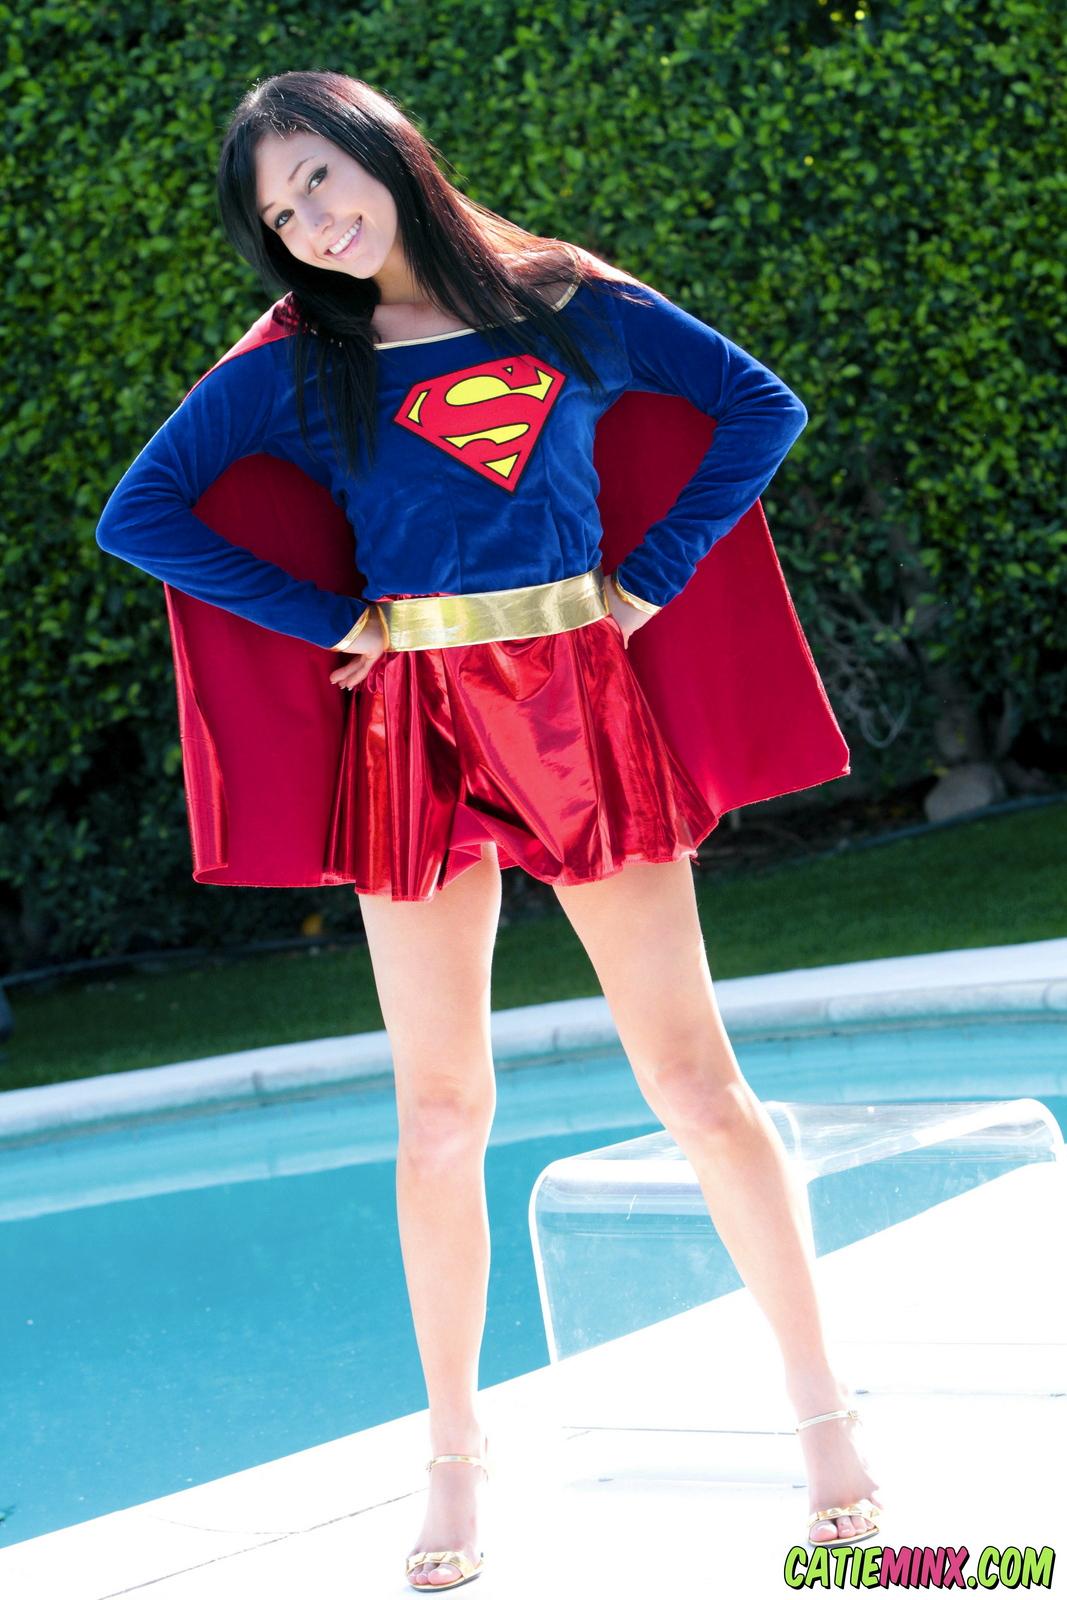 catie-minx-supergirl-costiume-poolside-young-brunette-nude-06